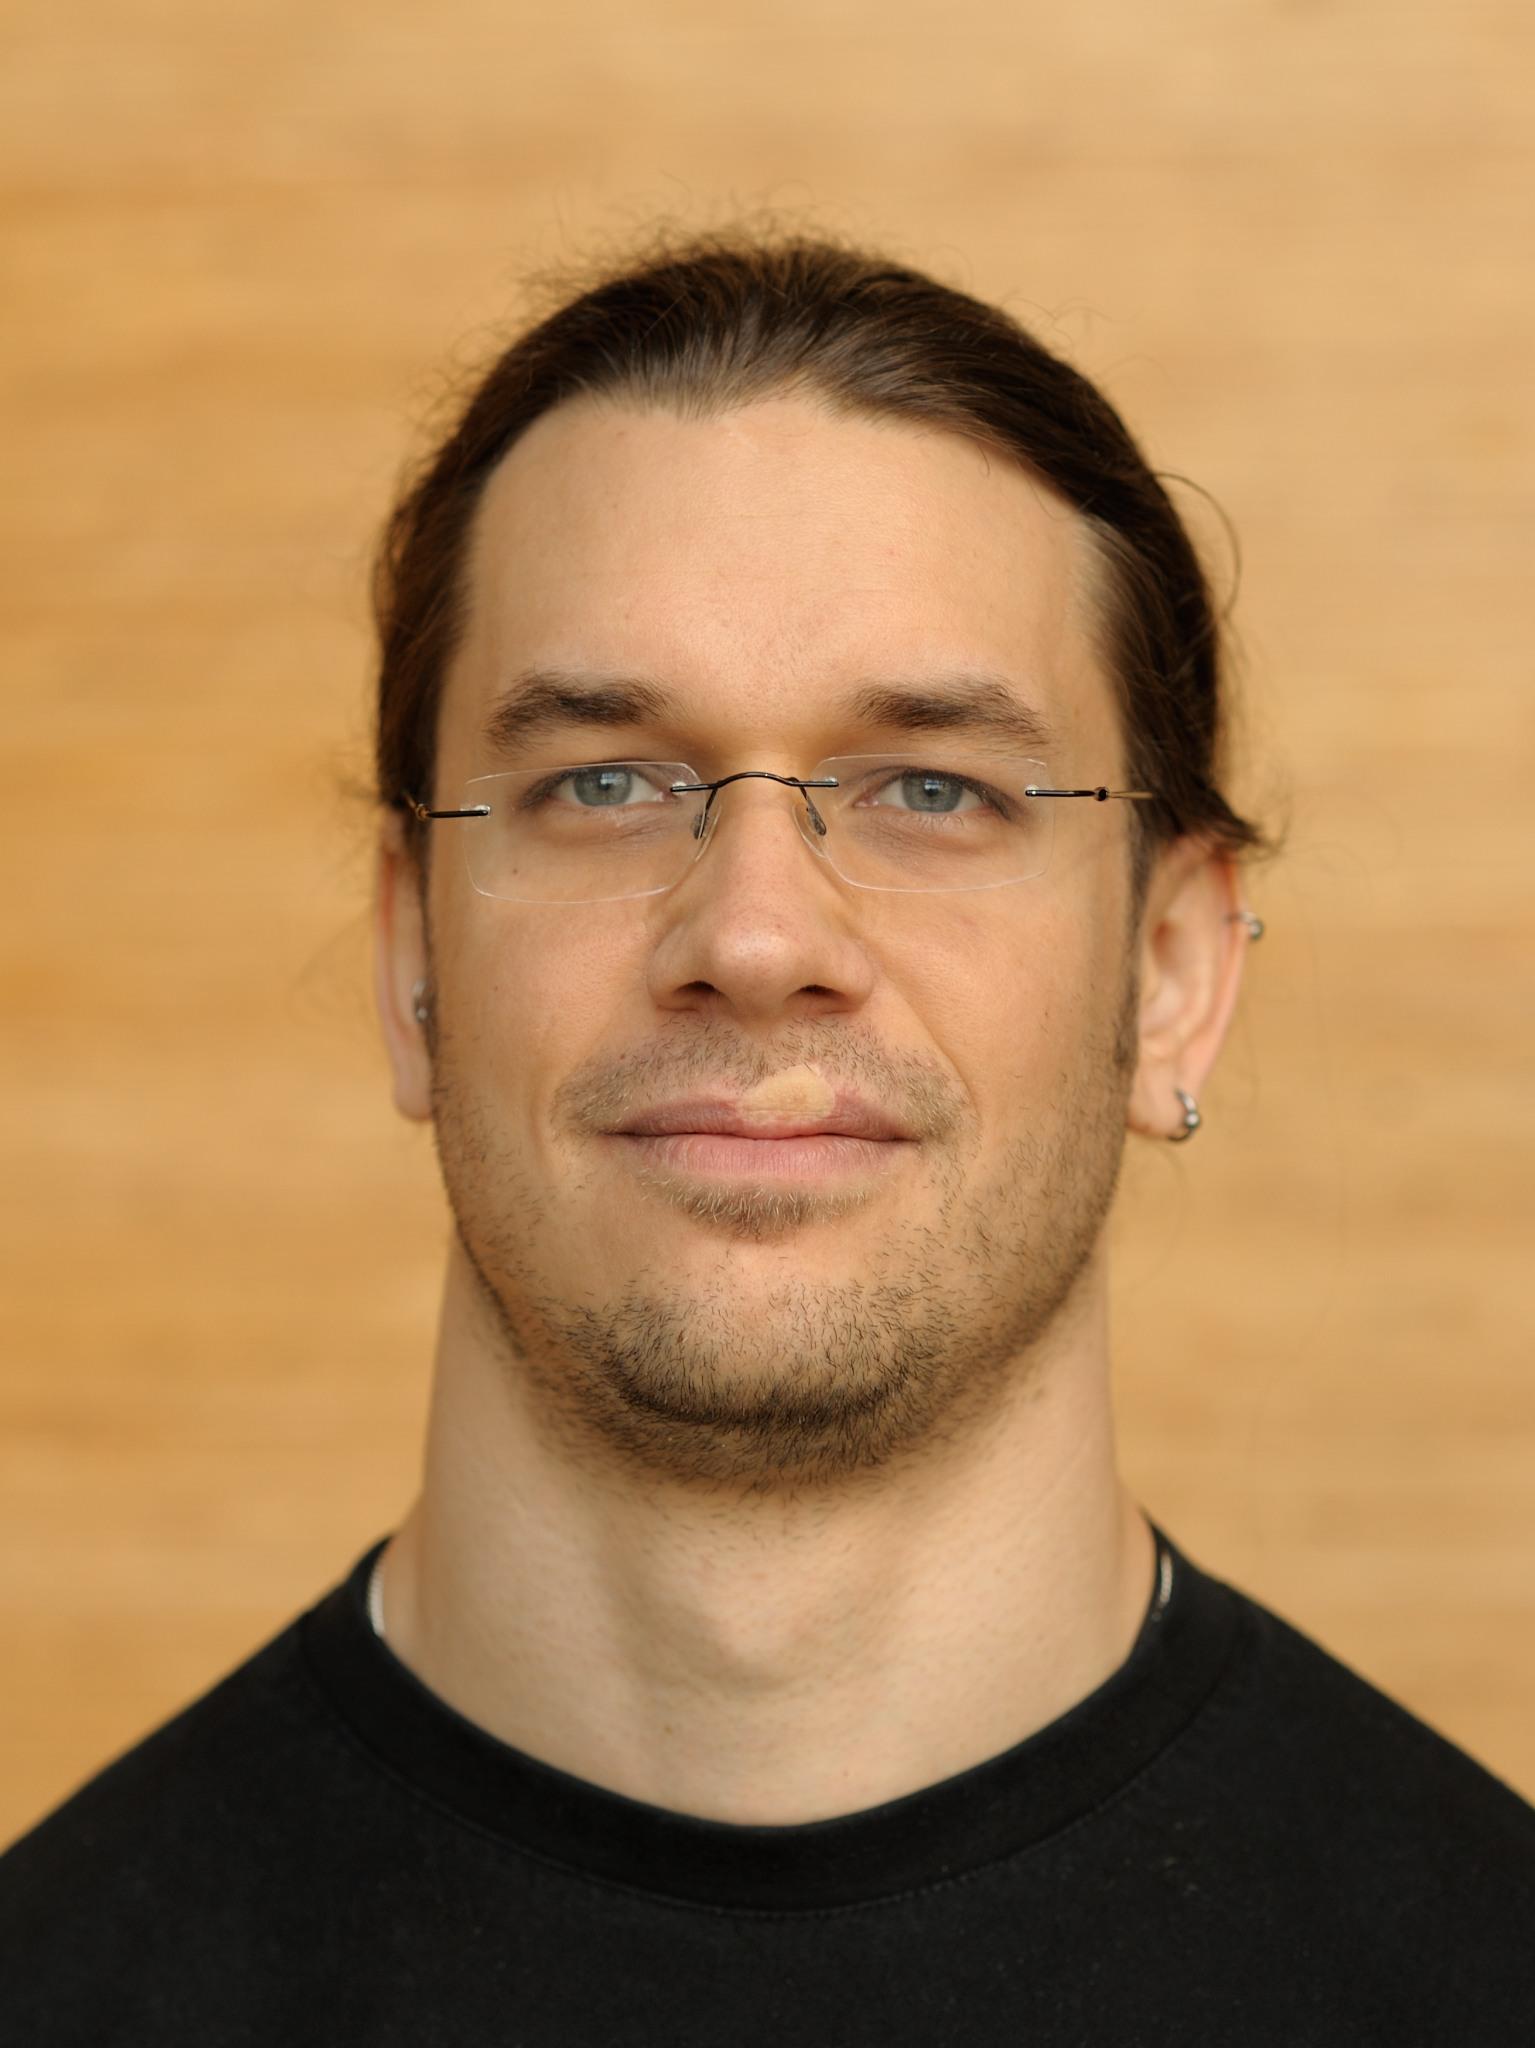 Michael Wrzaczek